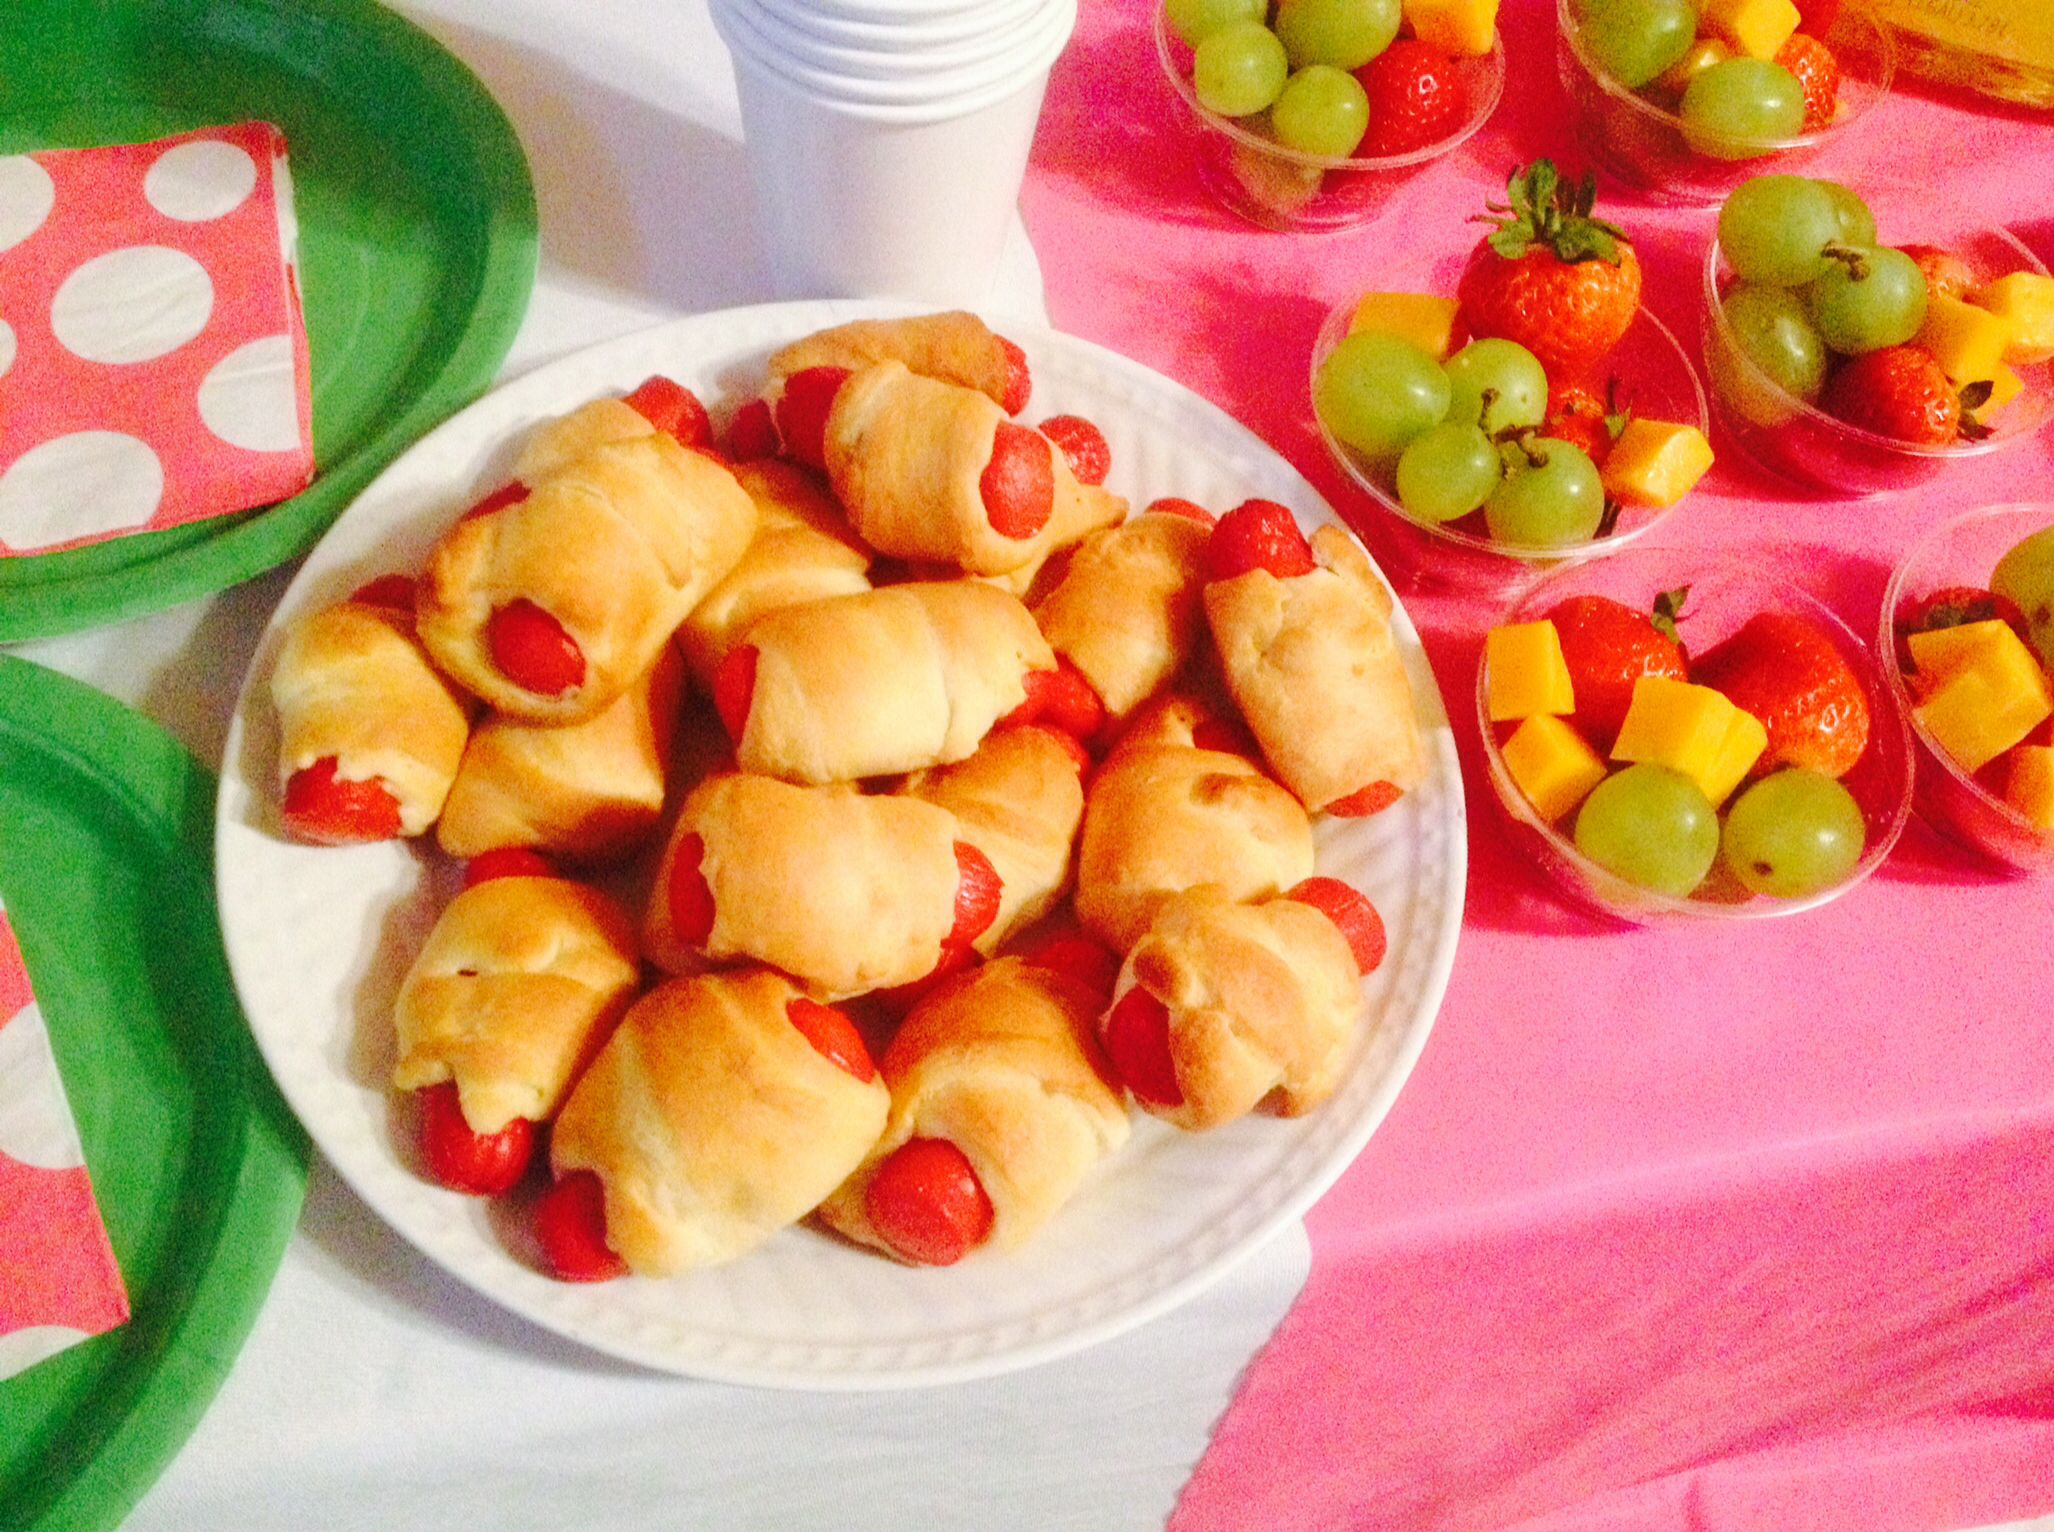 Girls tea party food ideas.... | Neat food ideas ...